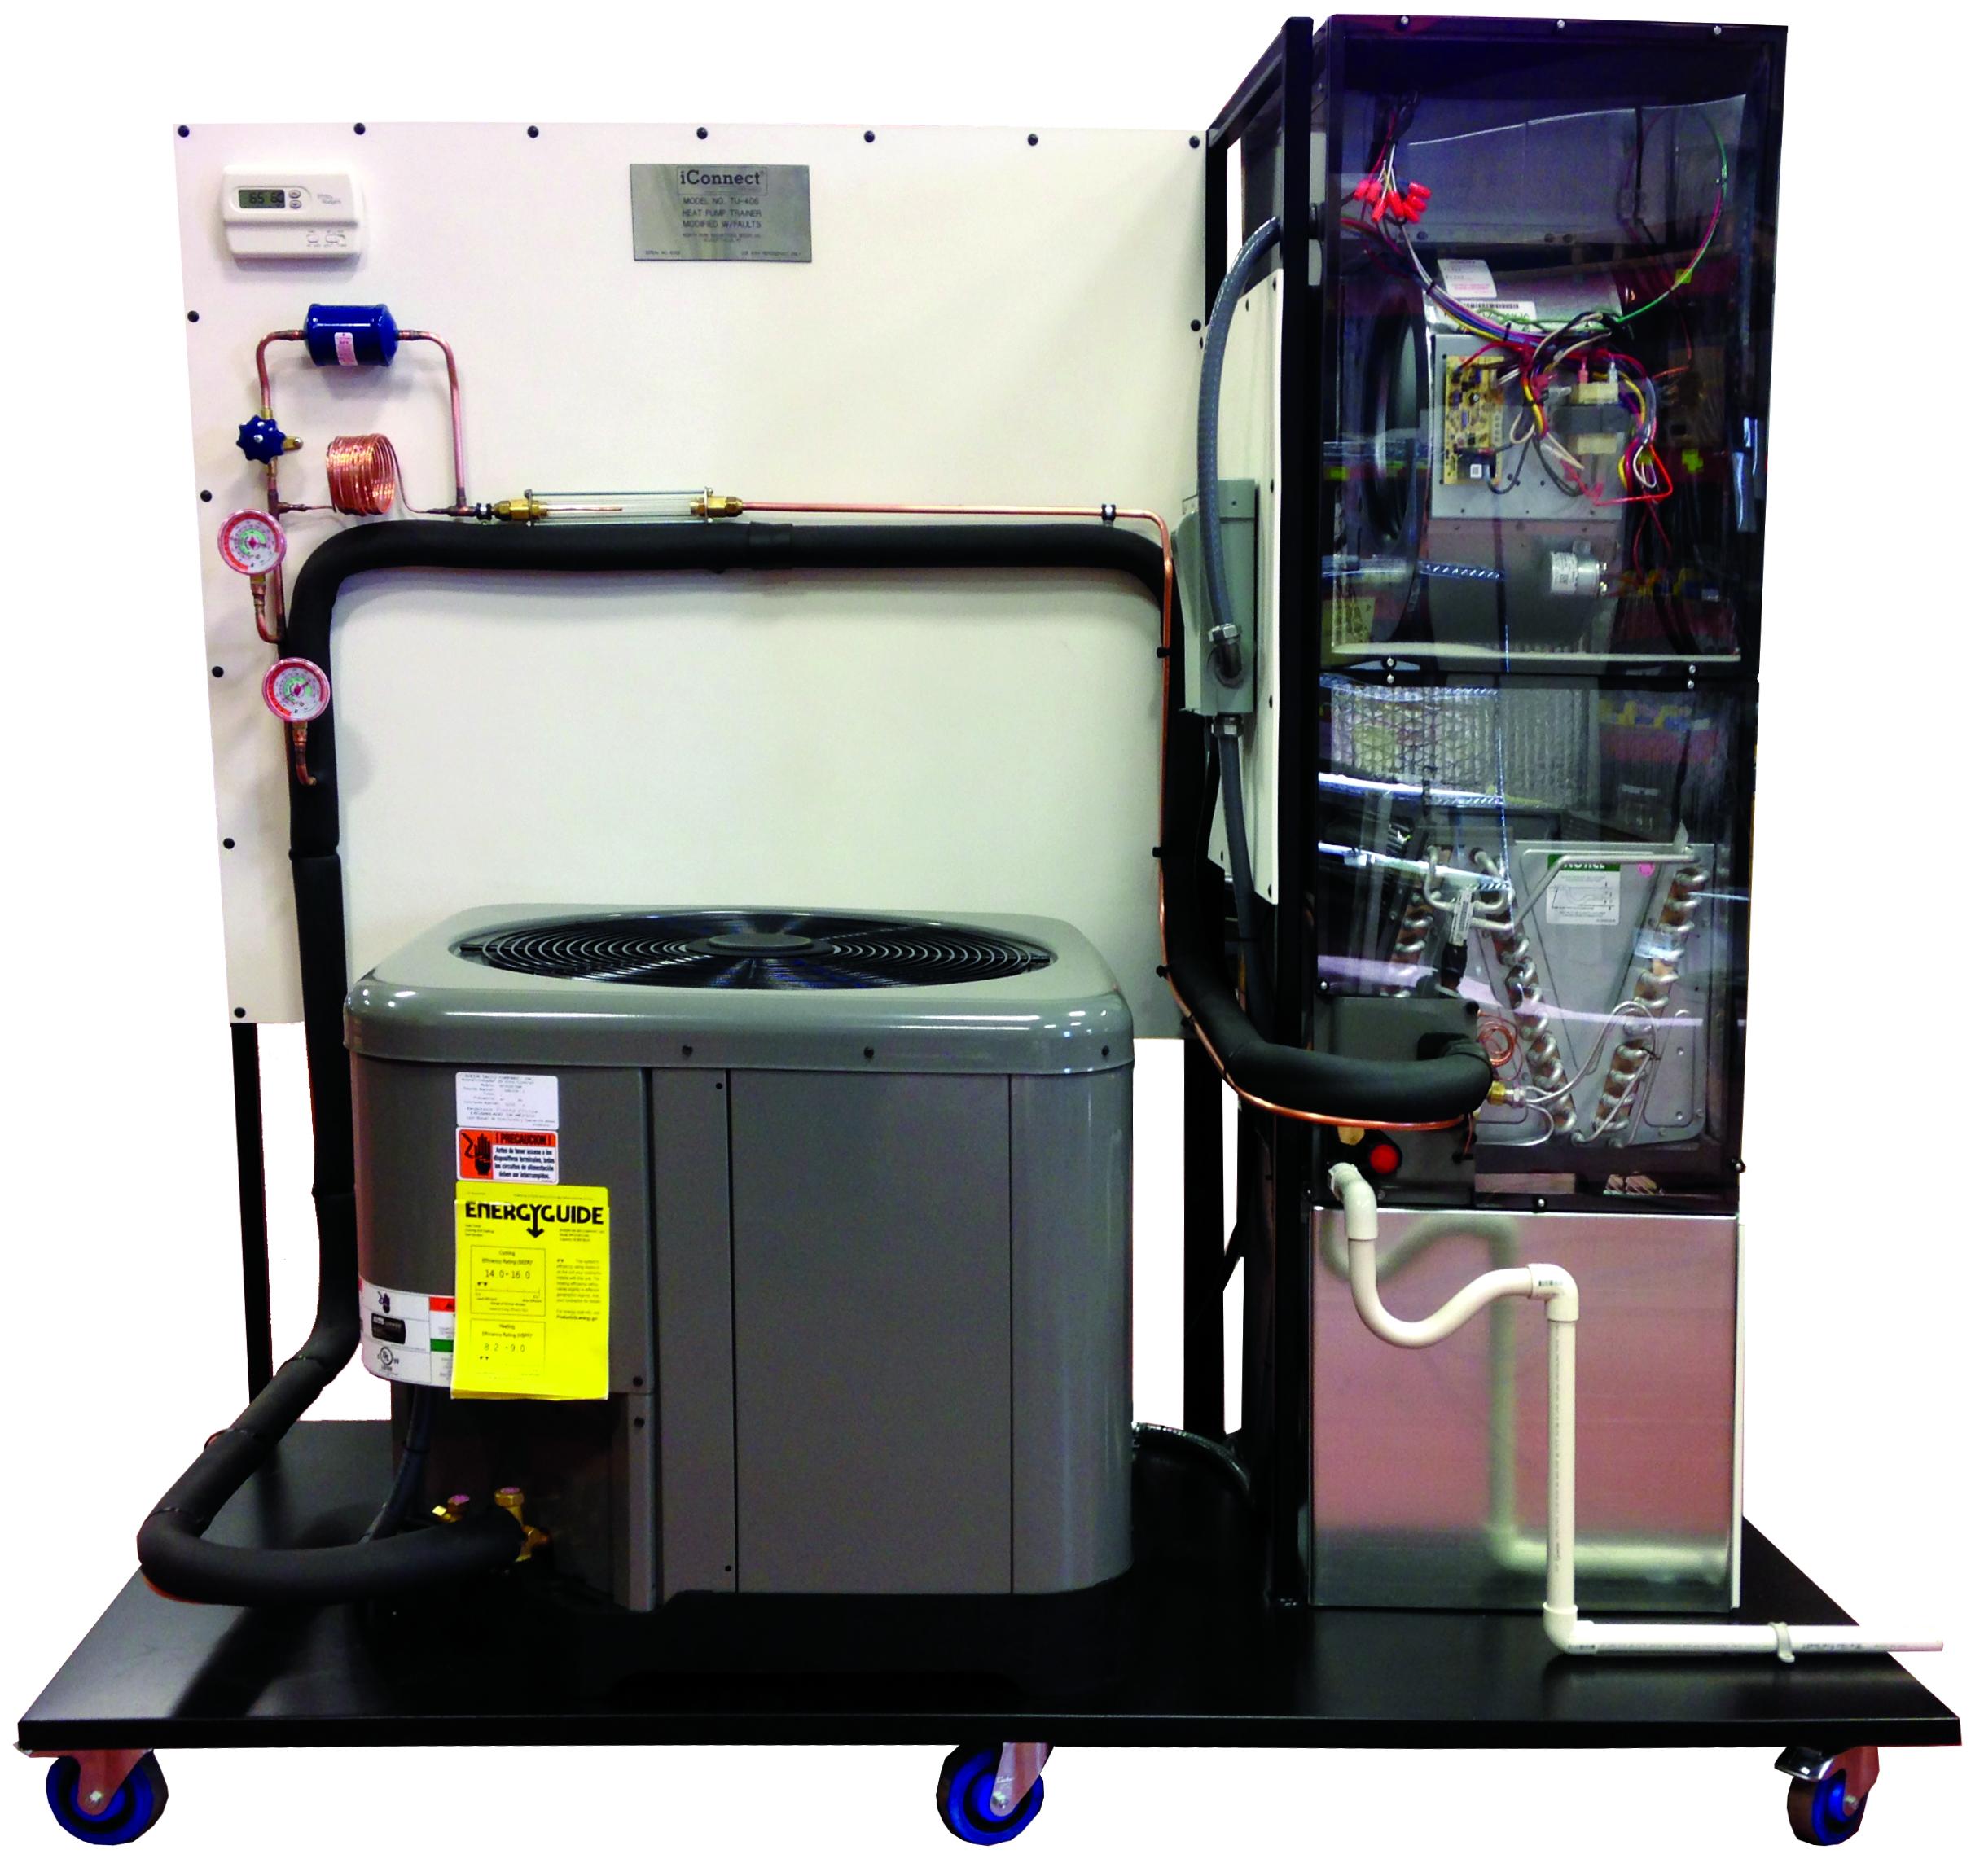 TU-406 Residential Heat Pump Trainer Image